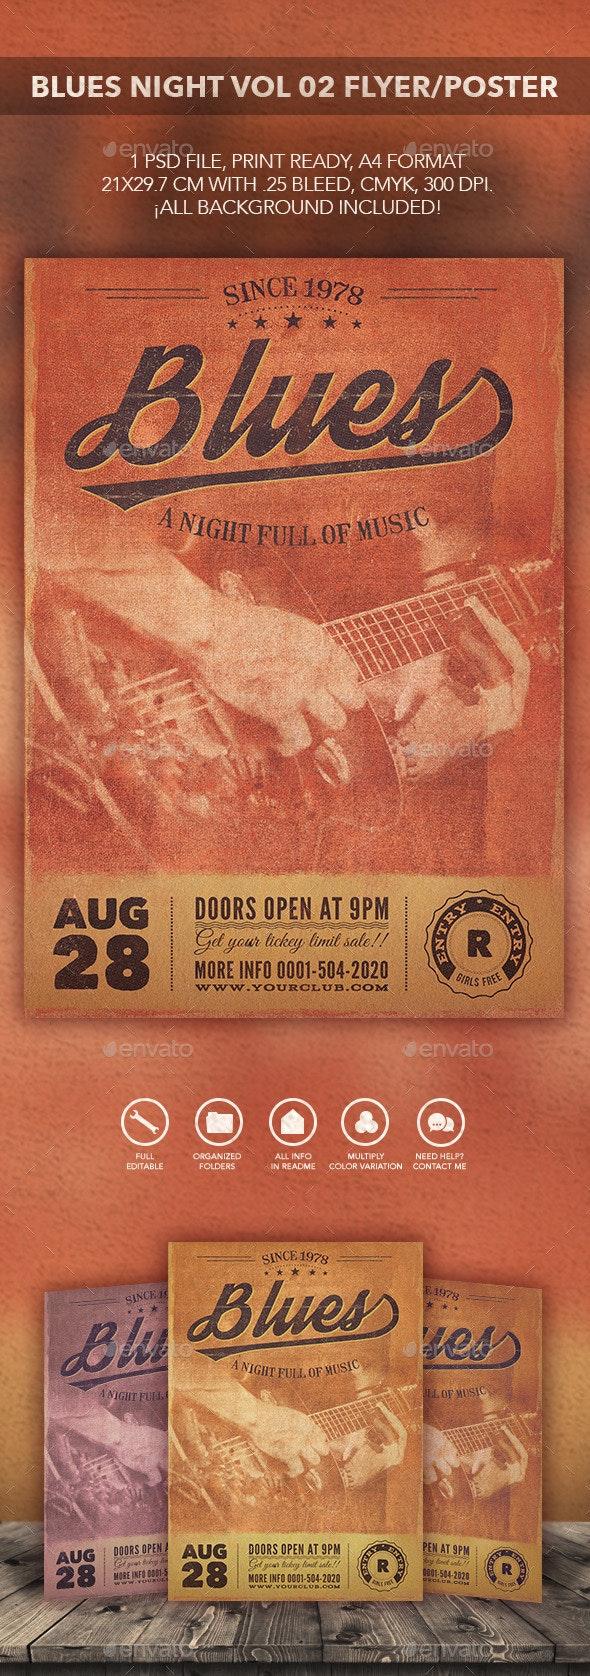 Blues Music Flyer Poster vol 02 - Flyers Print Templates